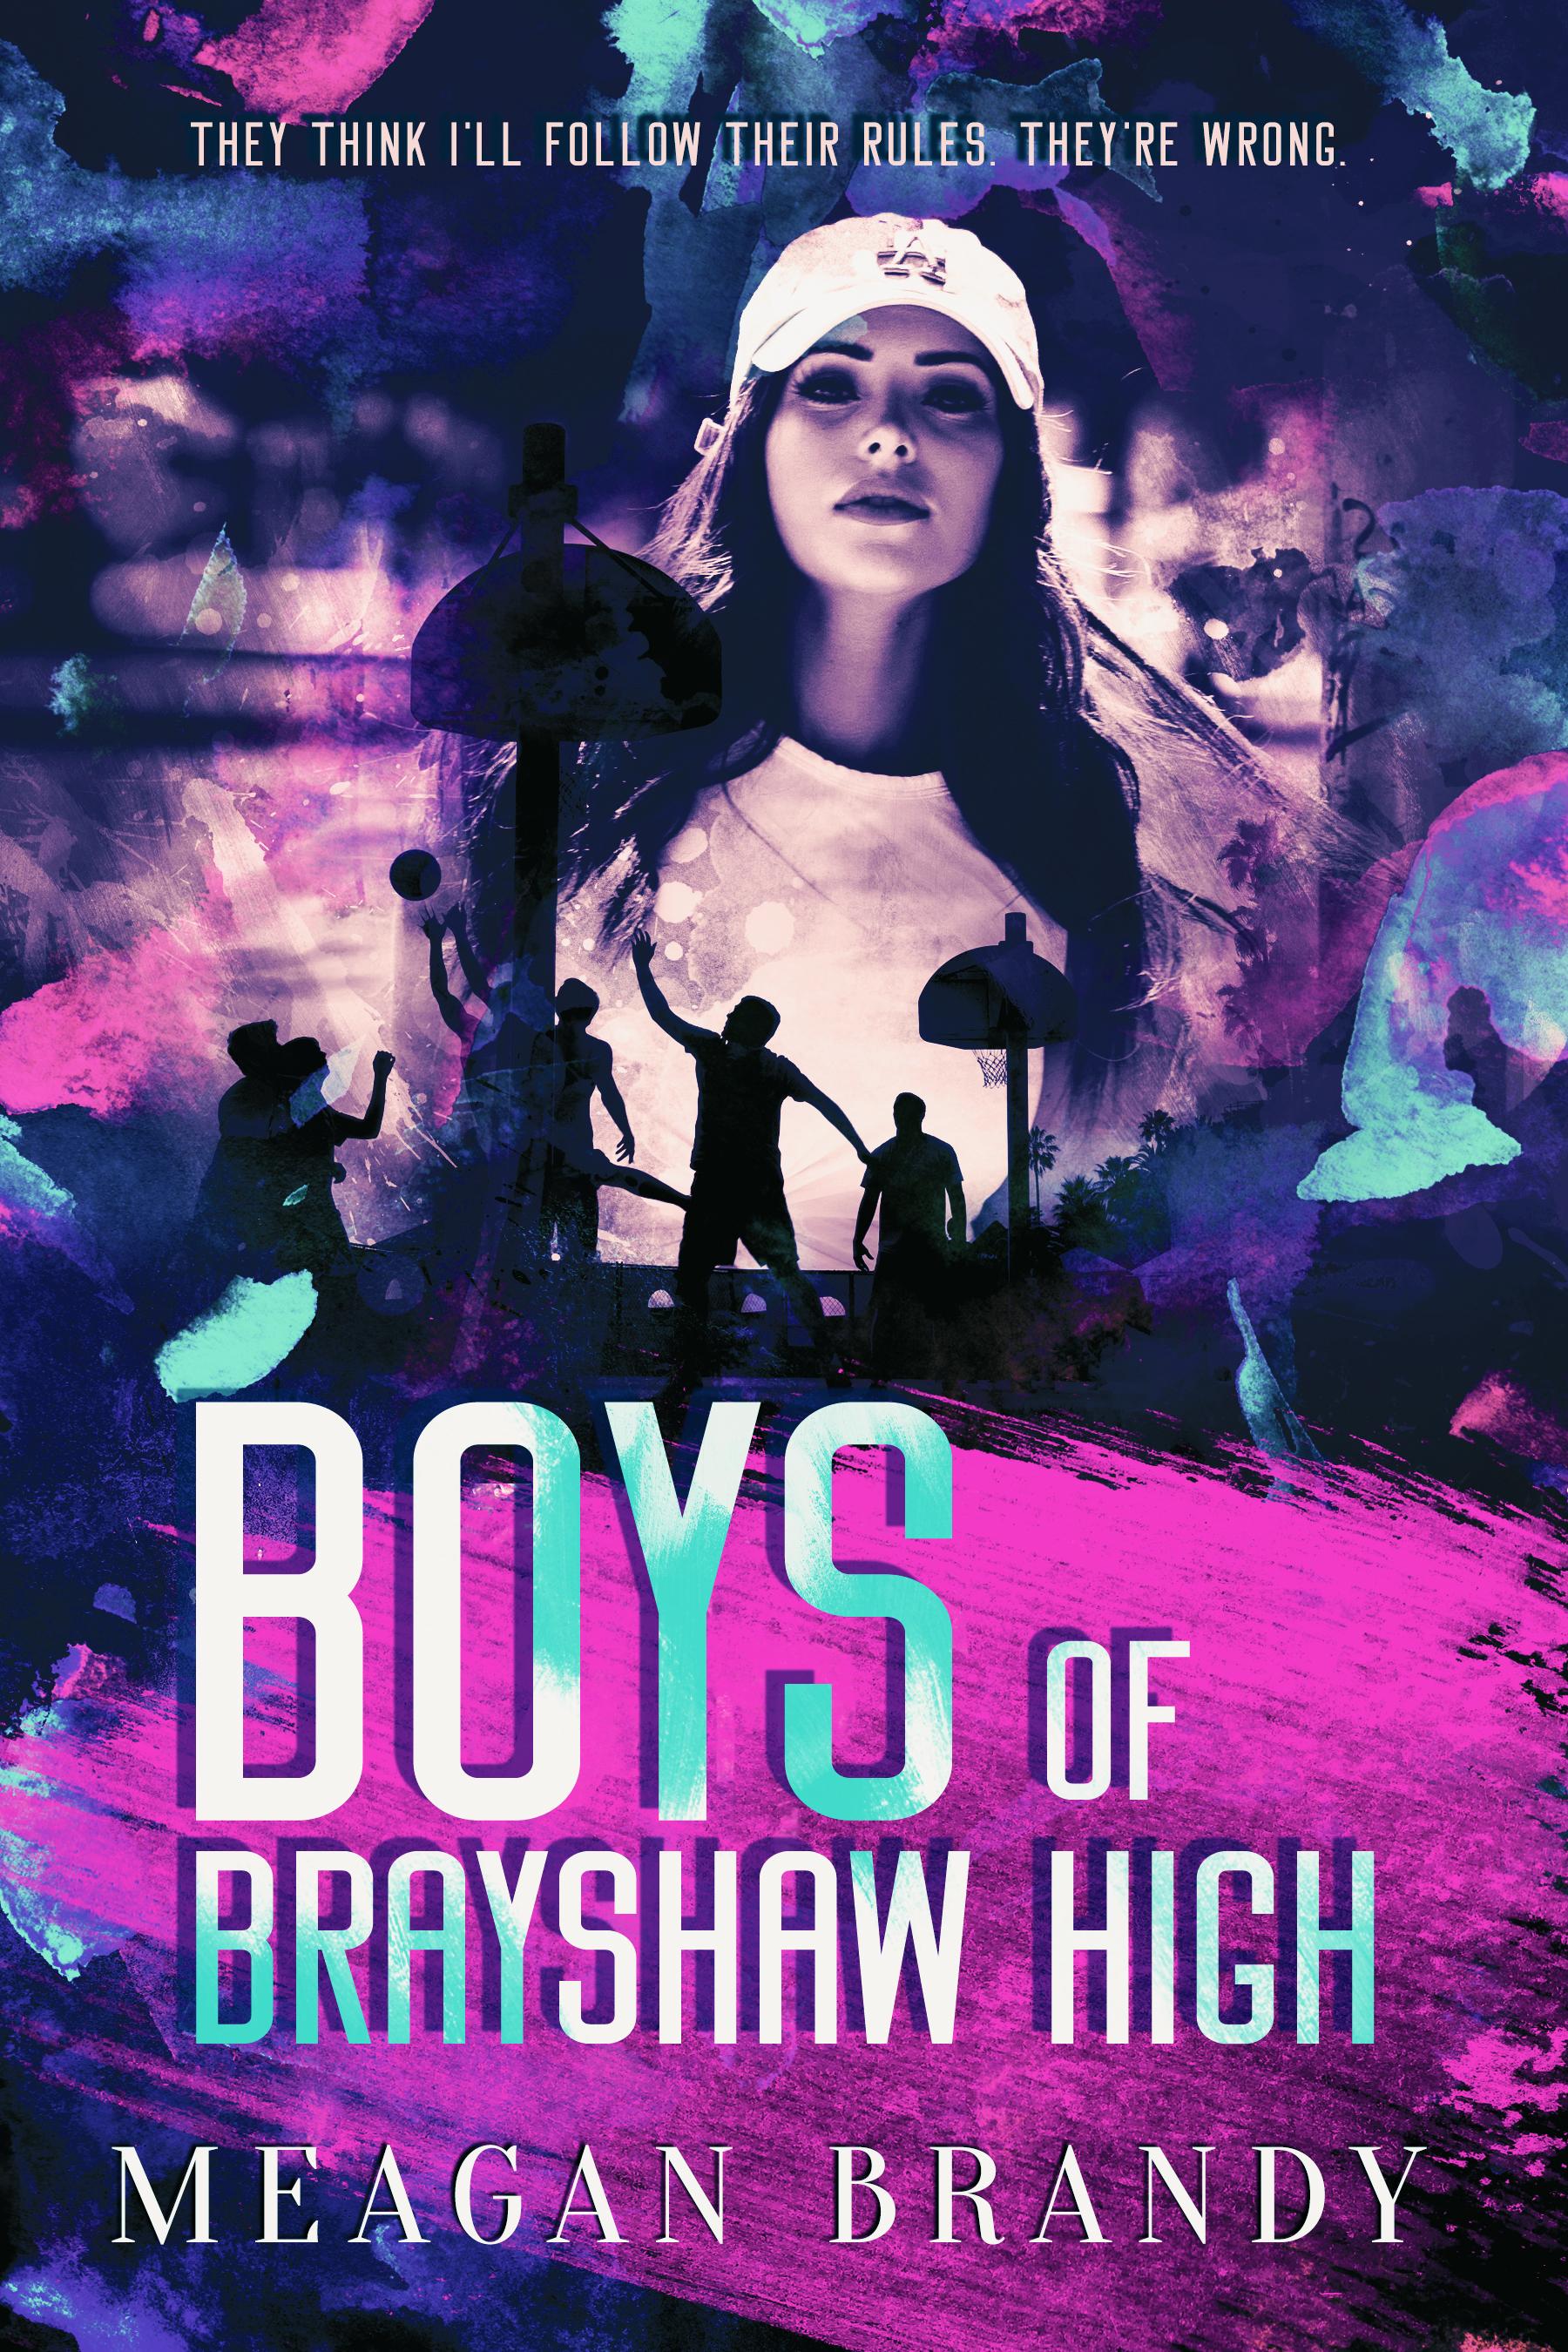 Boys of Brayshaw High by Meagan Brandy [Review]